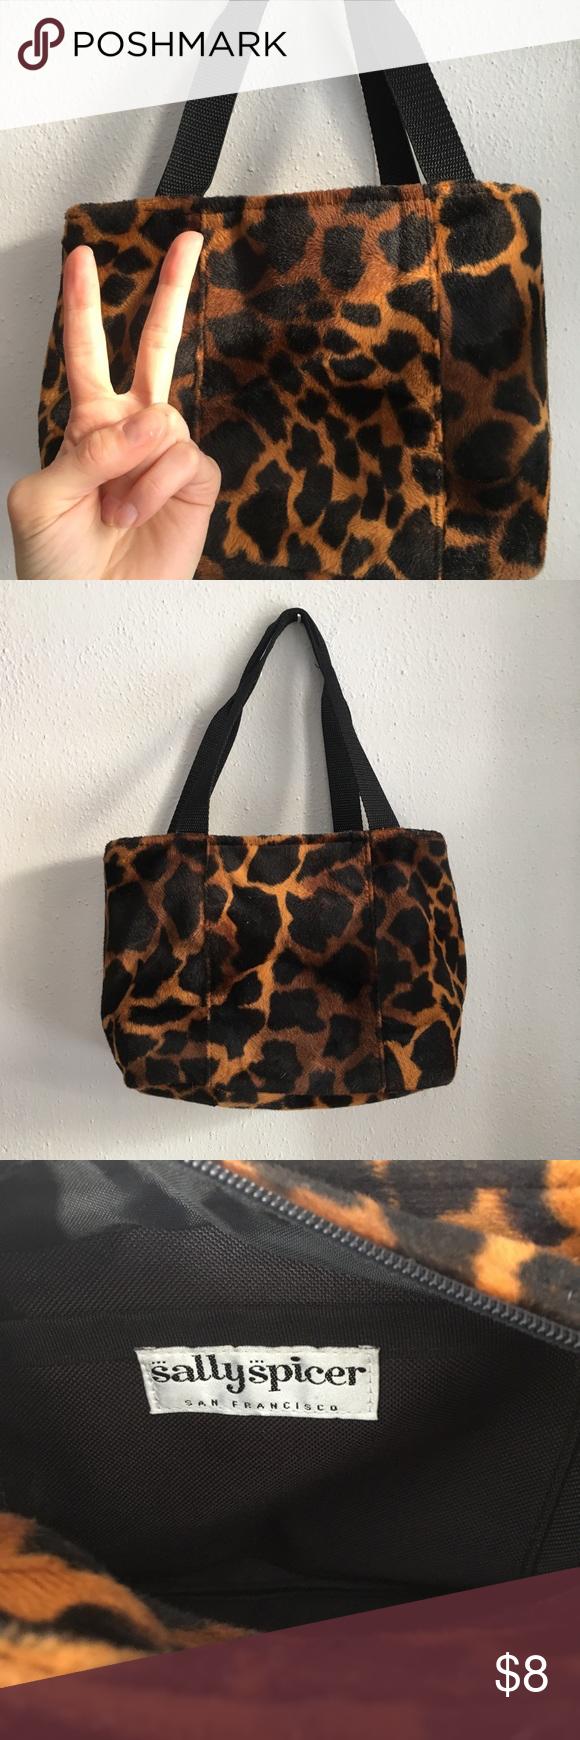 1f80cf4d7906 Faux fur animal print bag Has a cute early 2000s feel. Would make a good